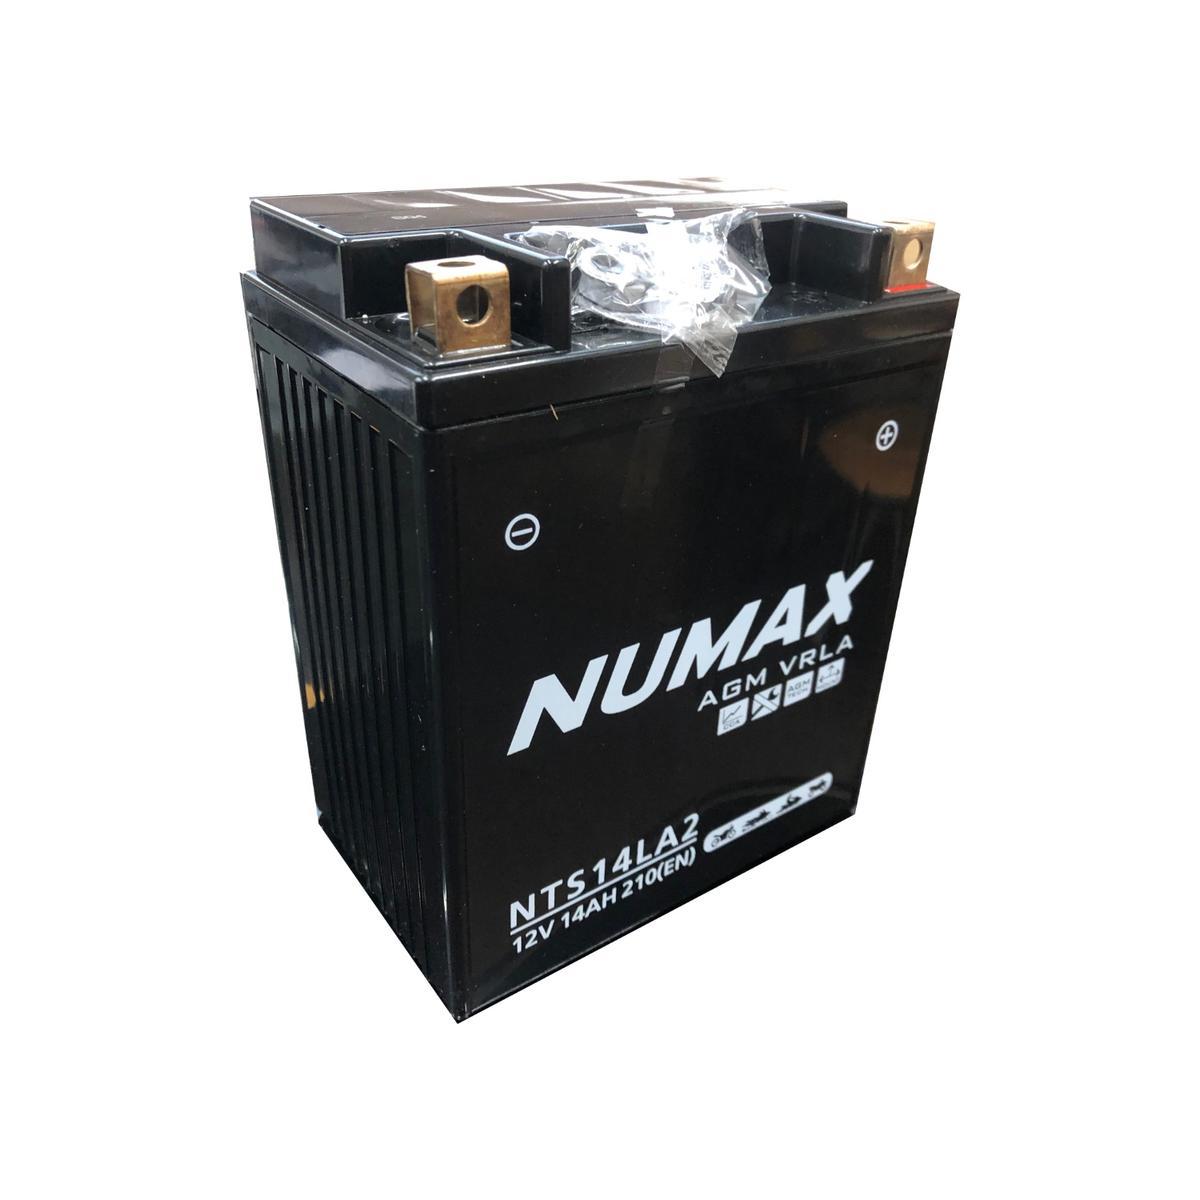 Numax NTS14LA2 Triumph Thunderbird 900 Motorcycle Battery